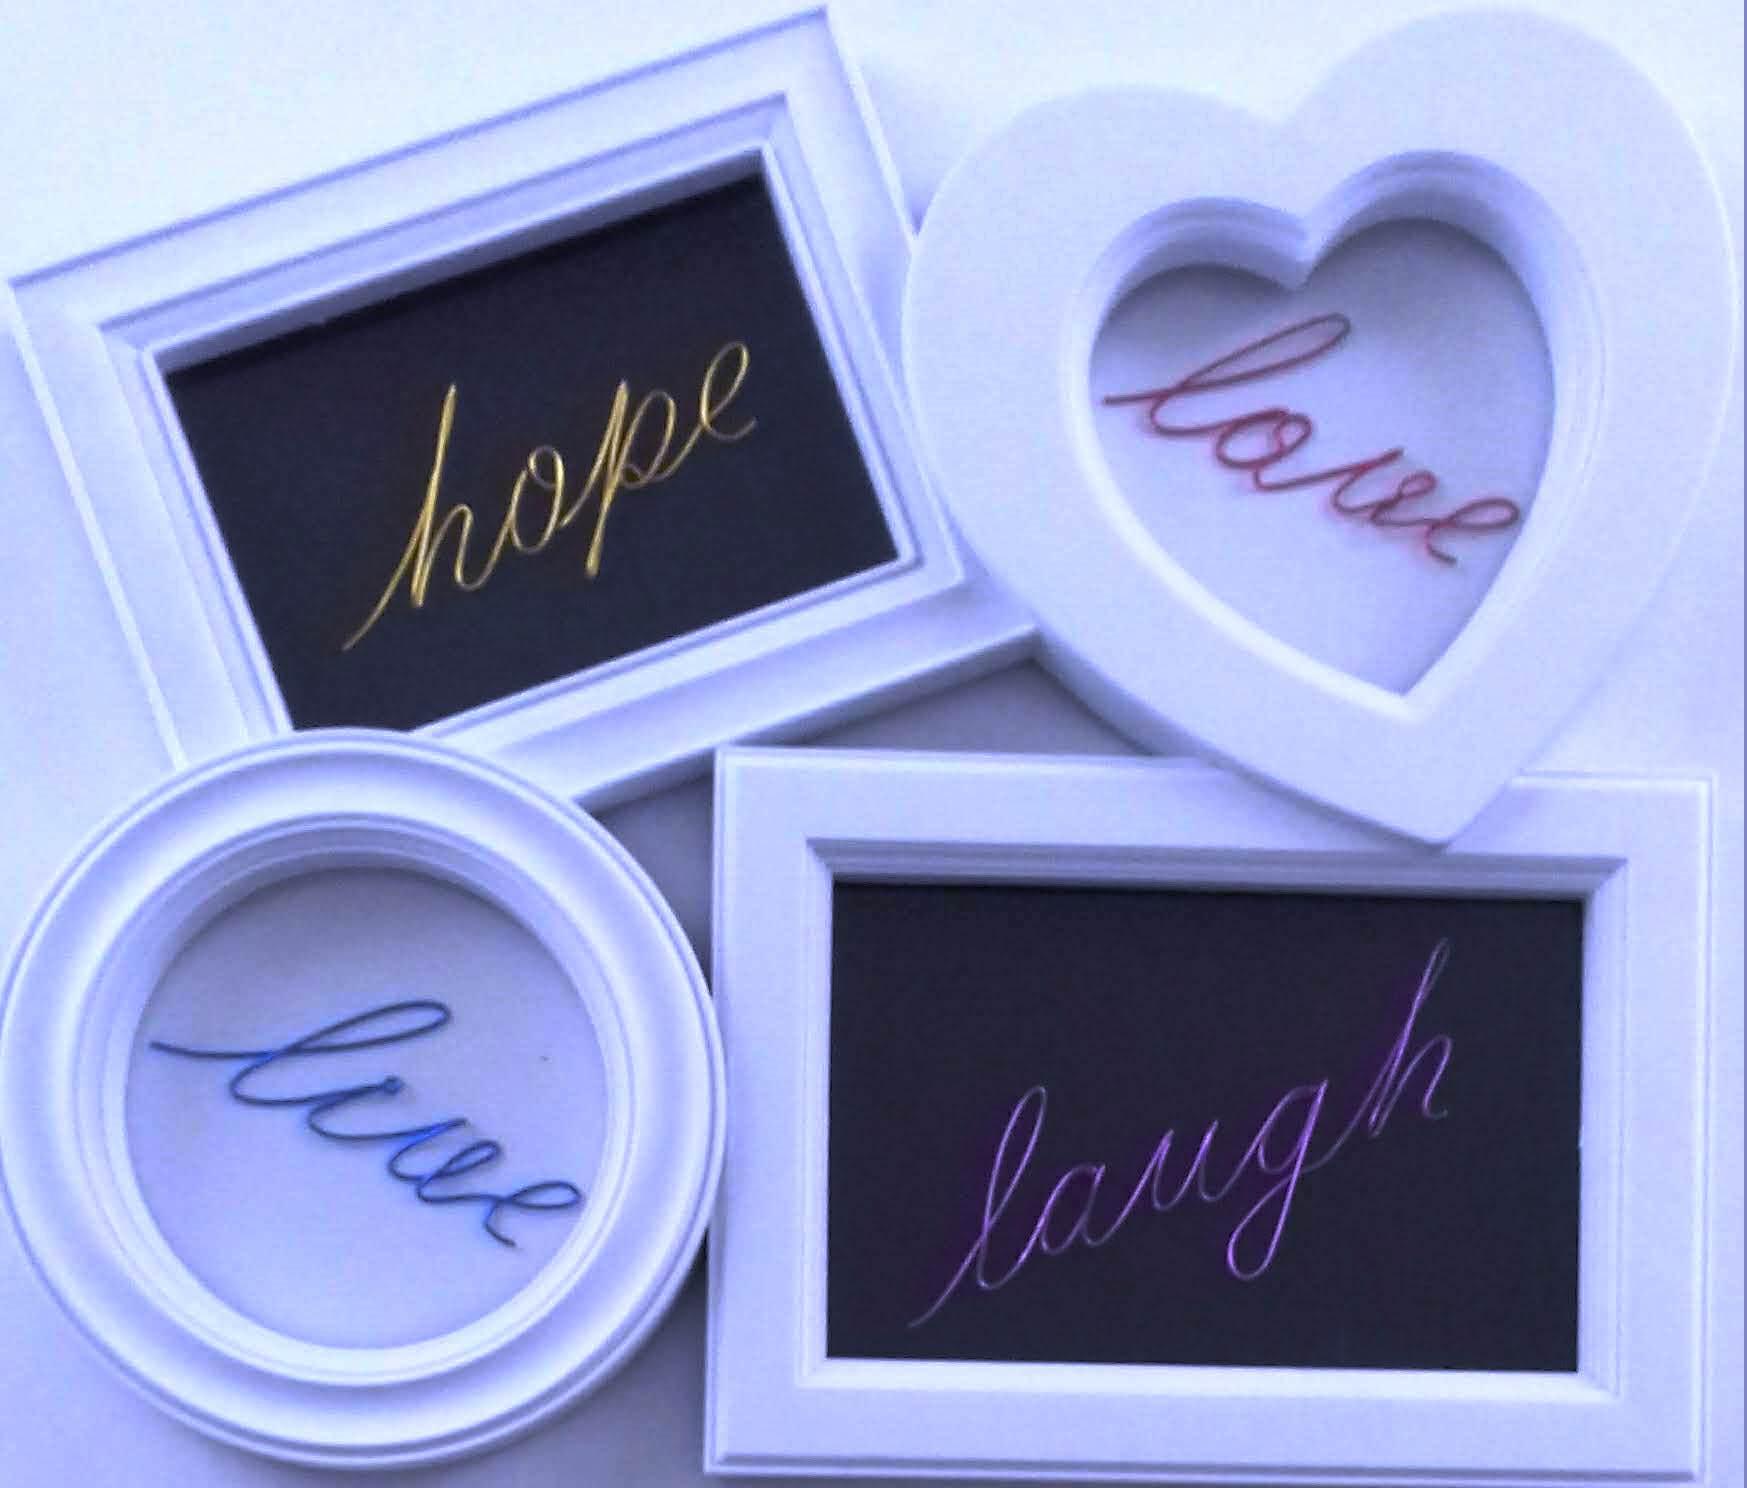 live love laugh hope 20180628_144846-1